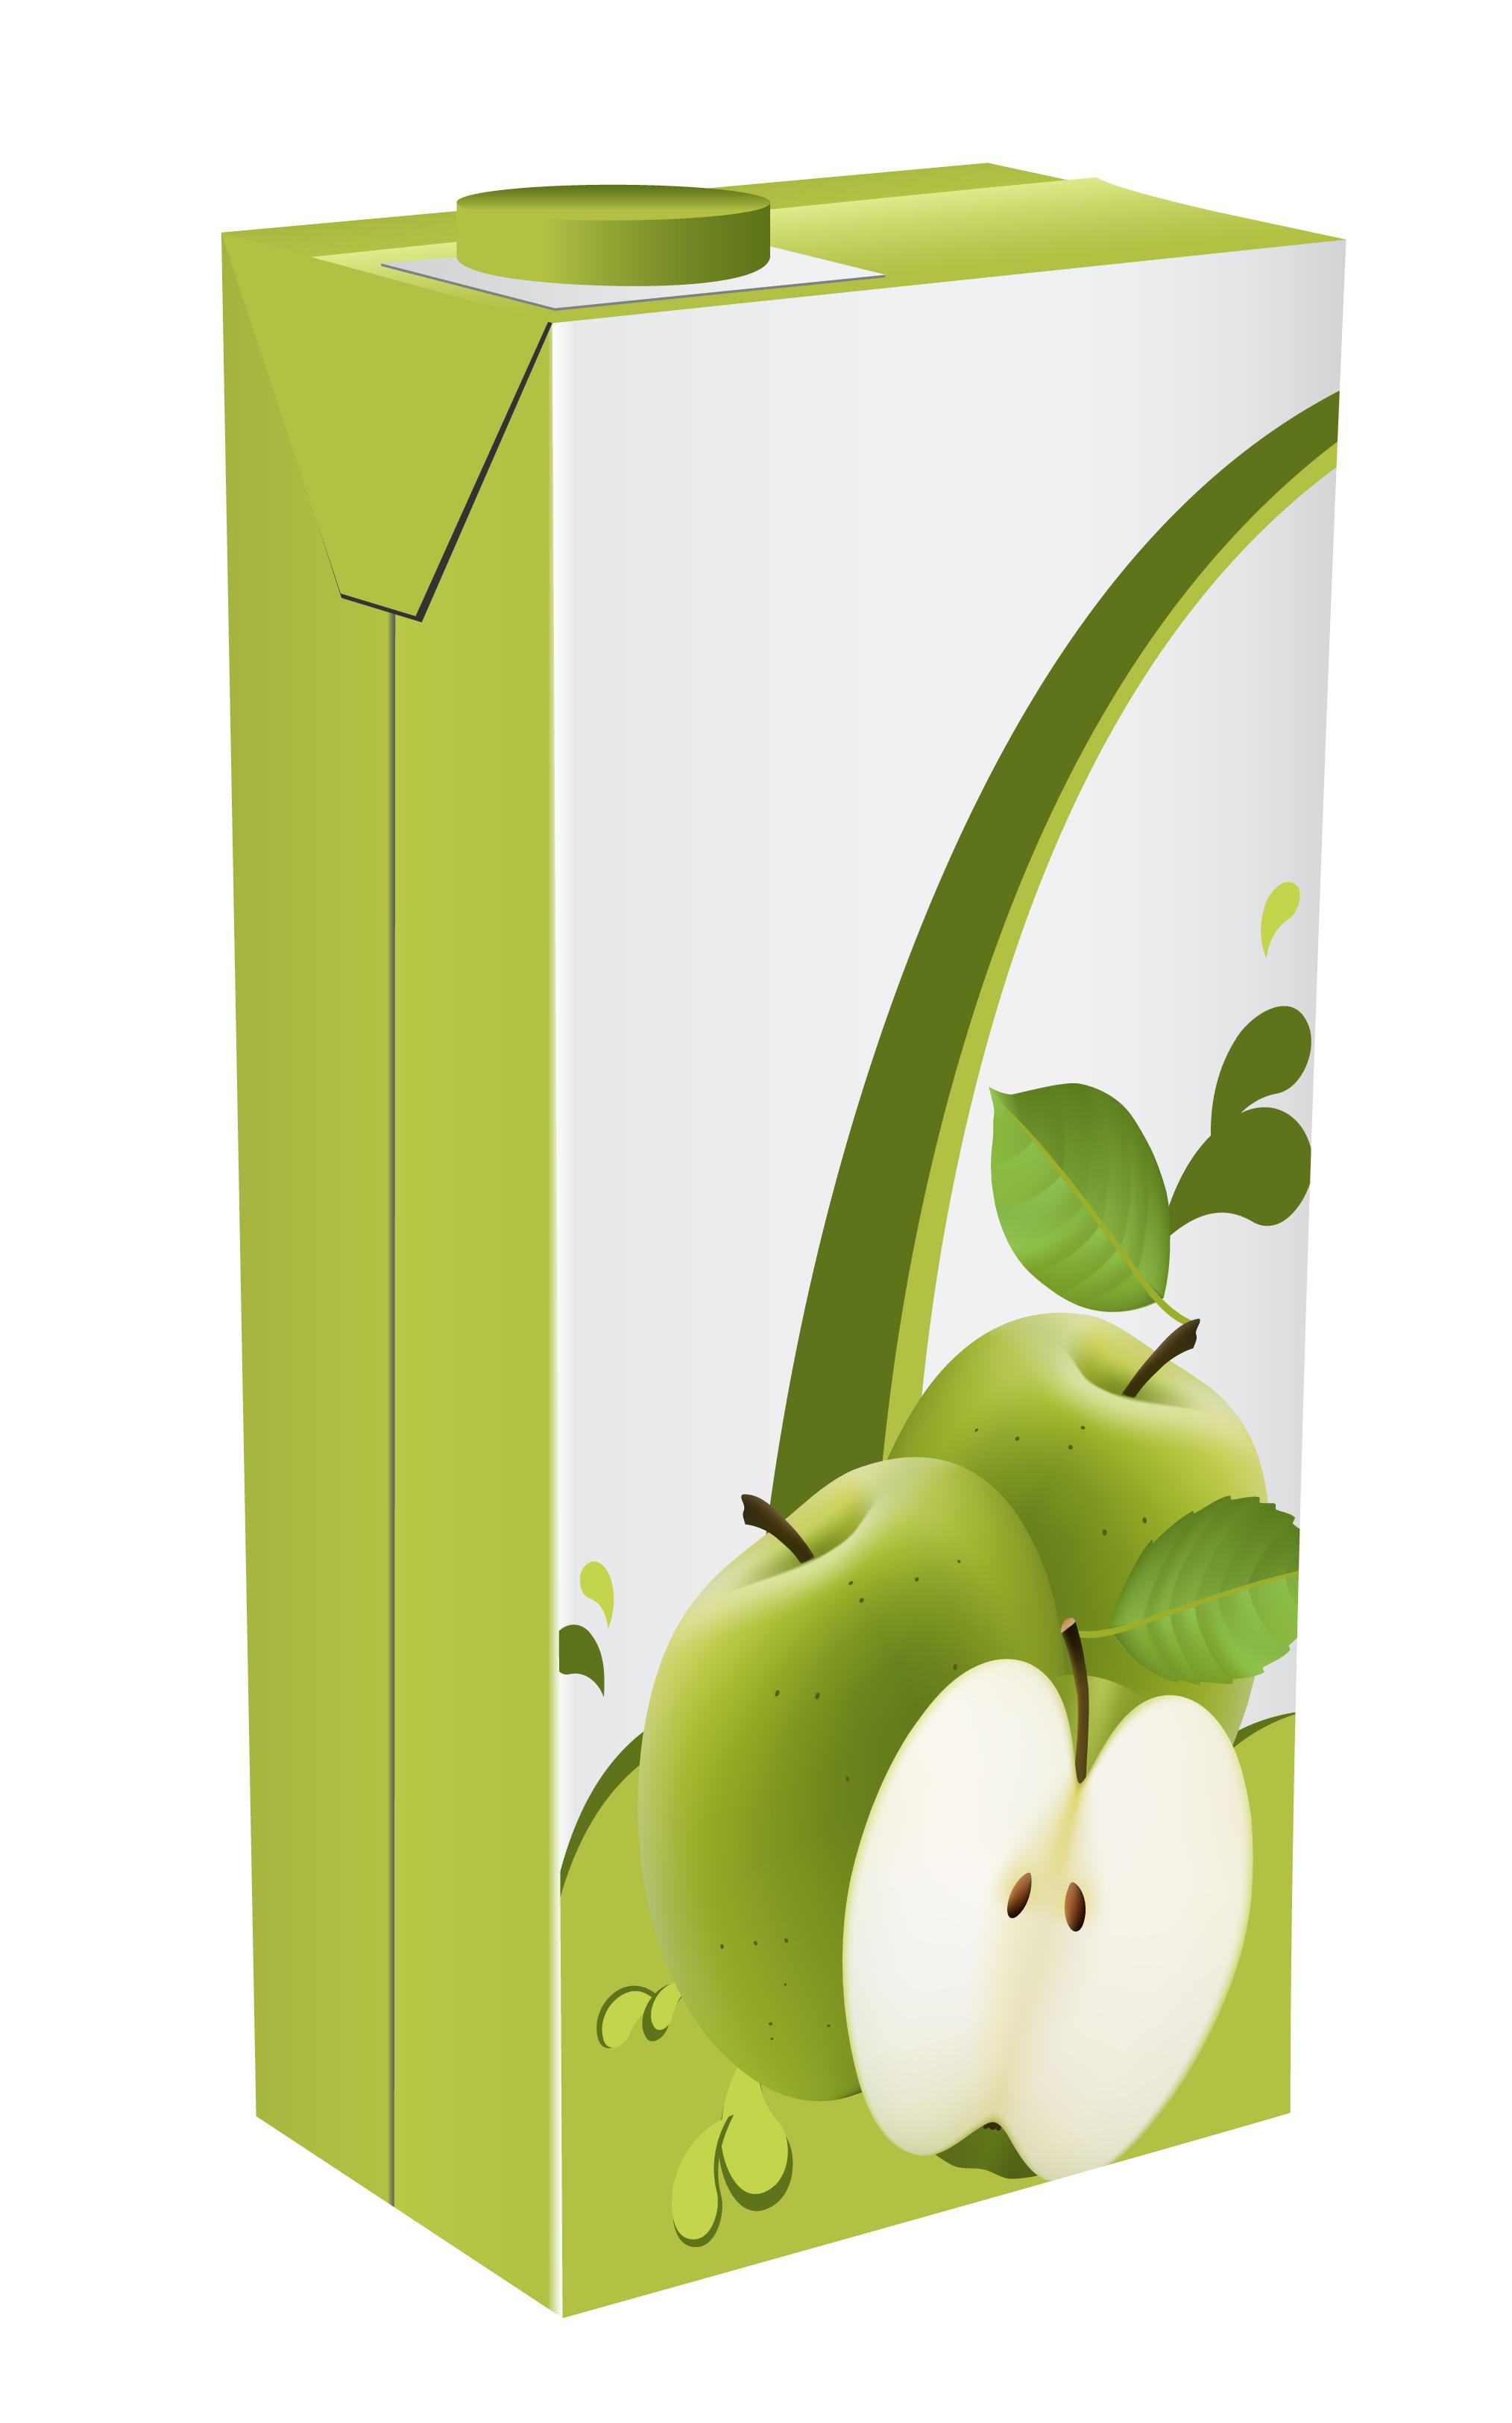 Apple Juice Drinks Package Design Vector 01 Free Download